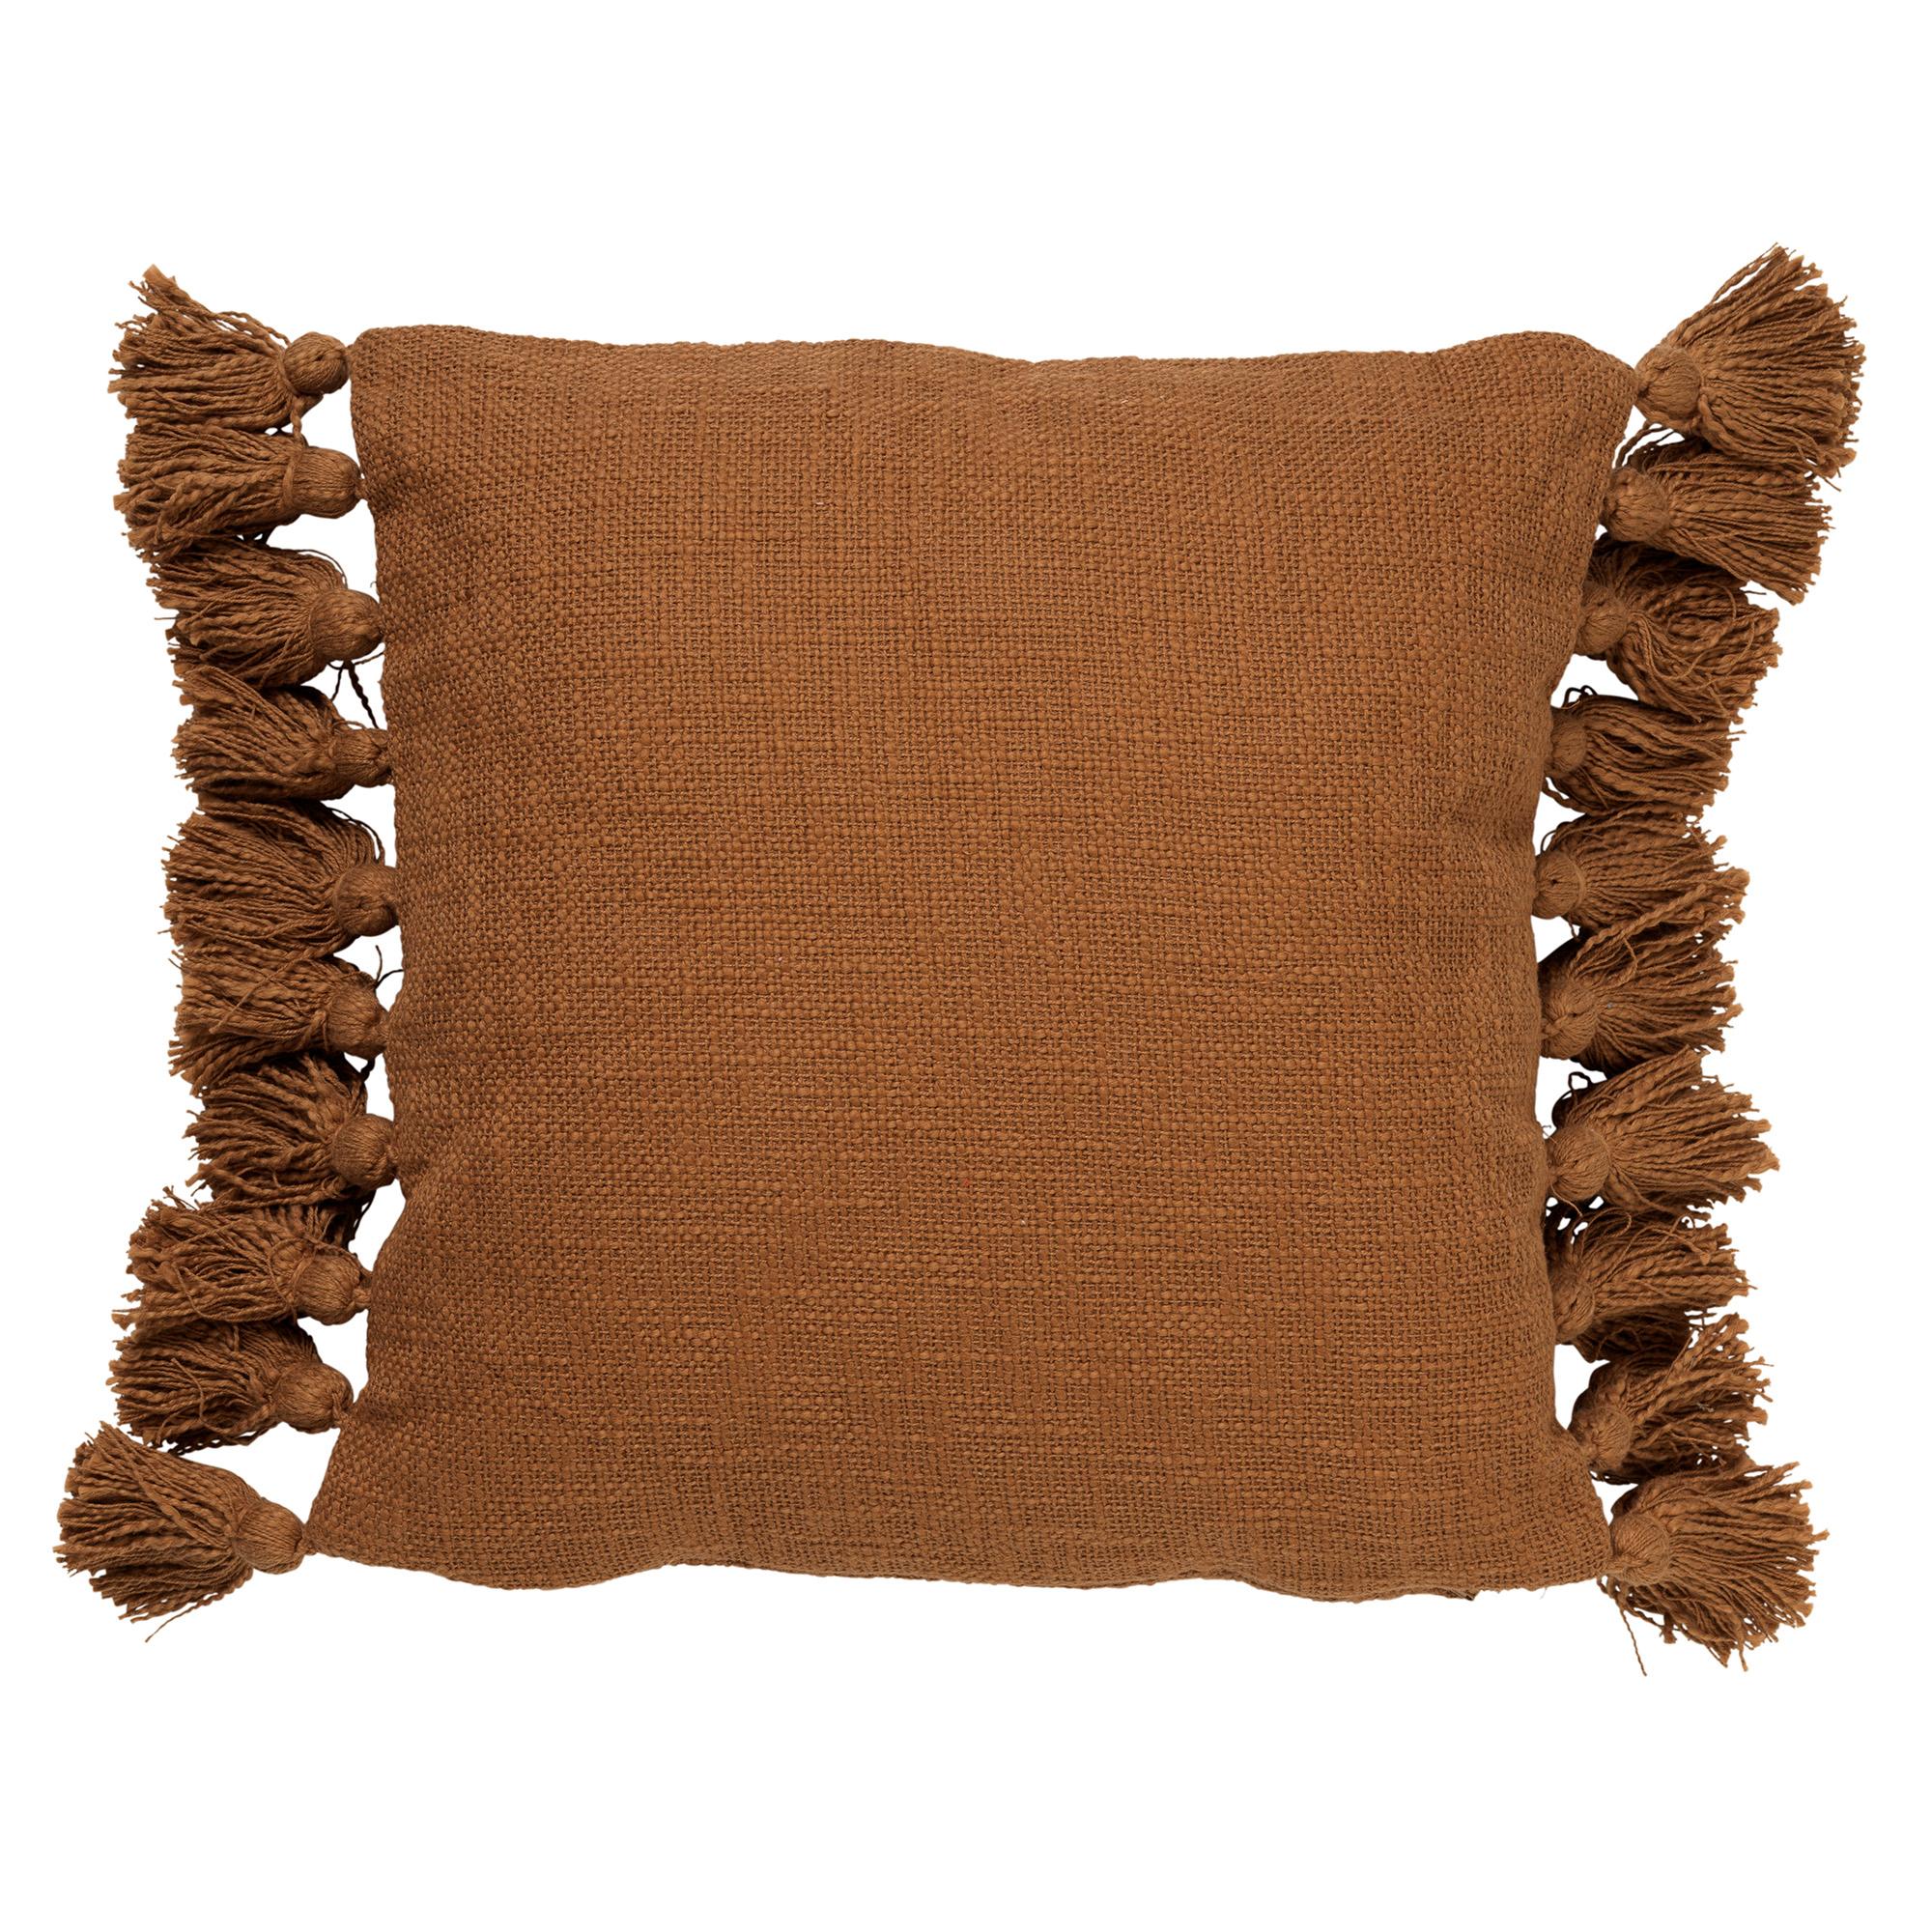 RUBY - Sierkussen van katoen Tobacco Brown 45x45 cm